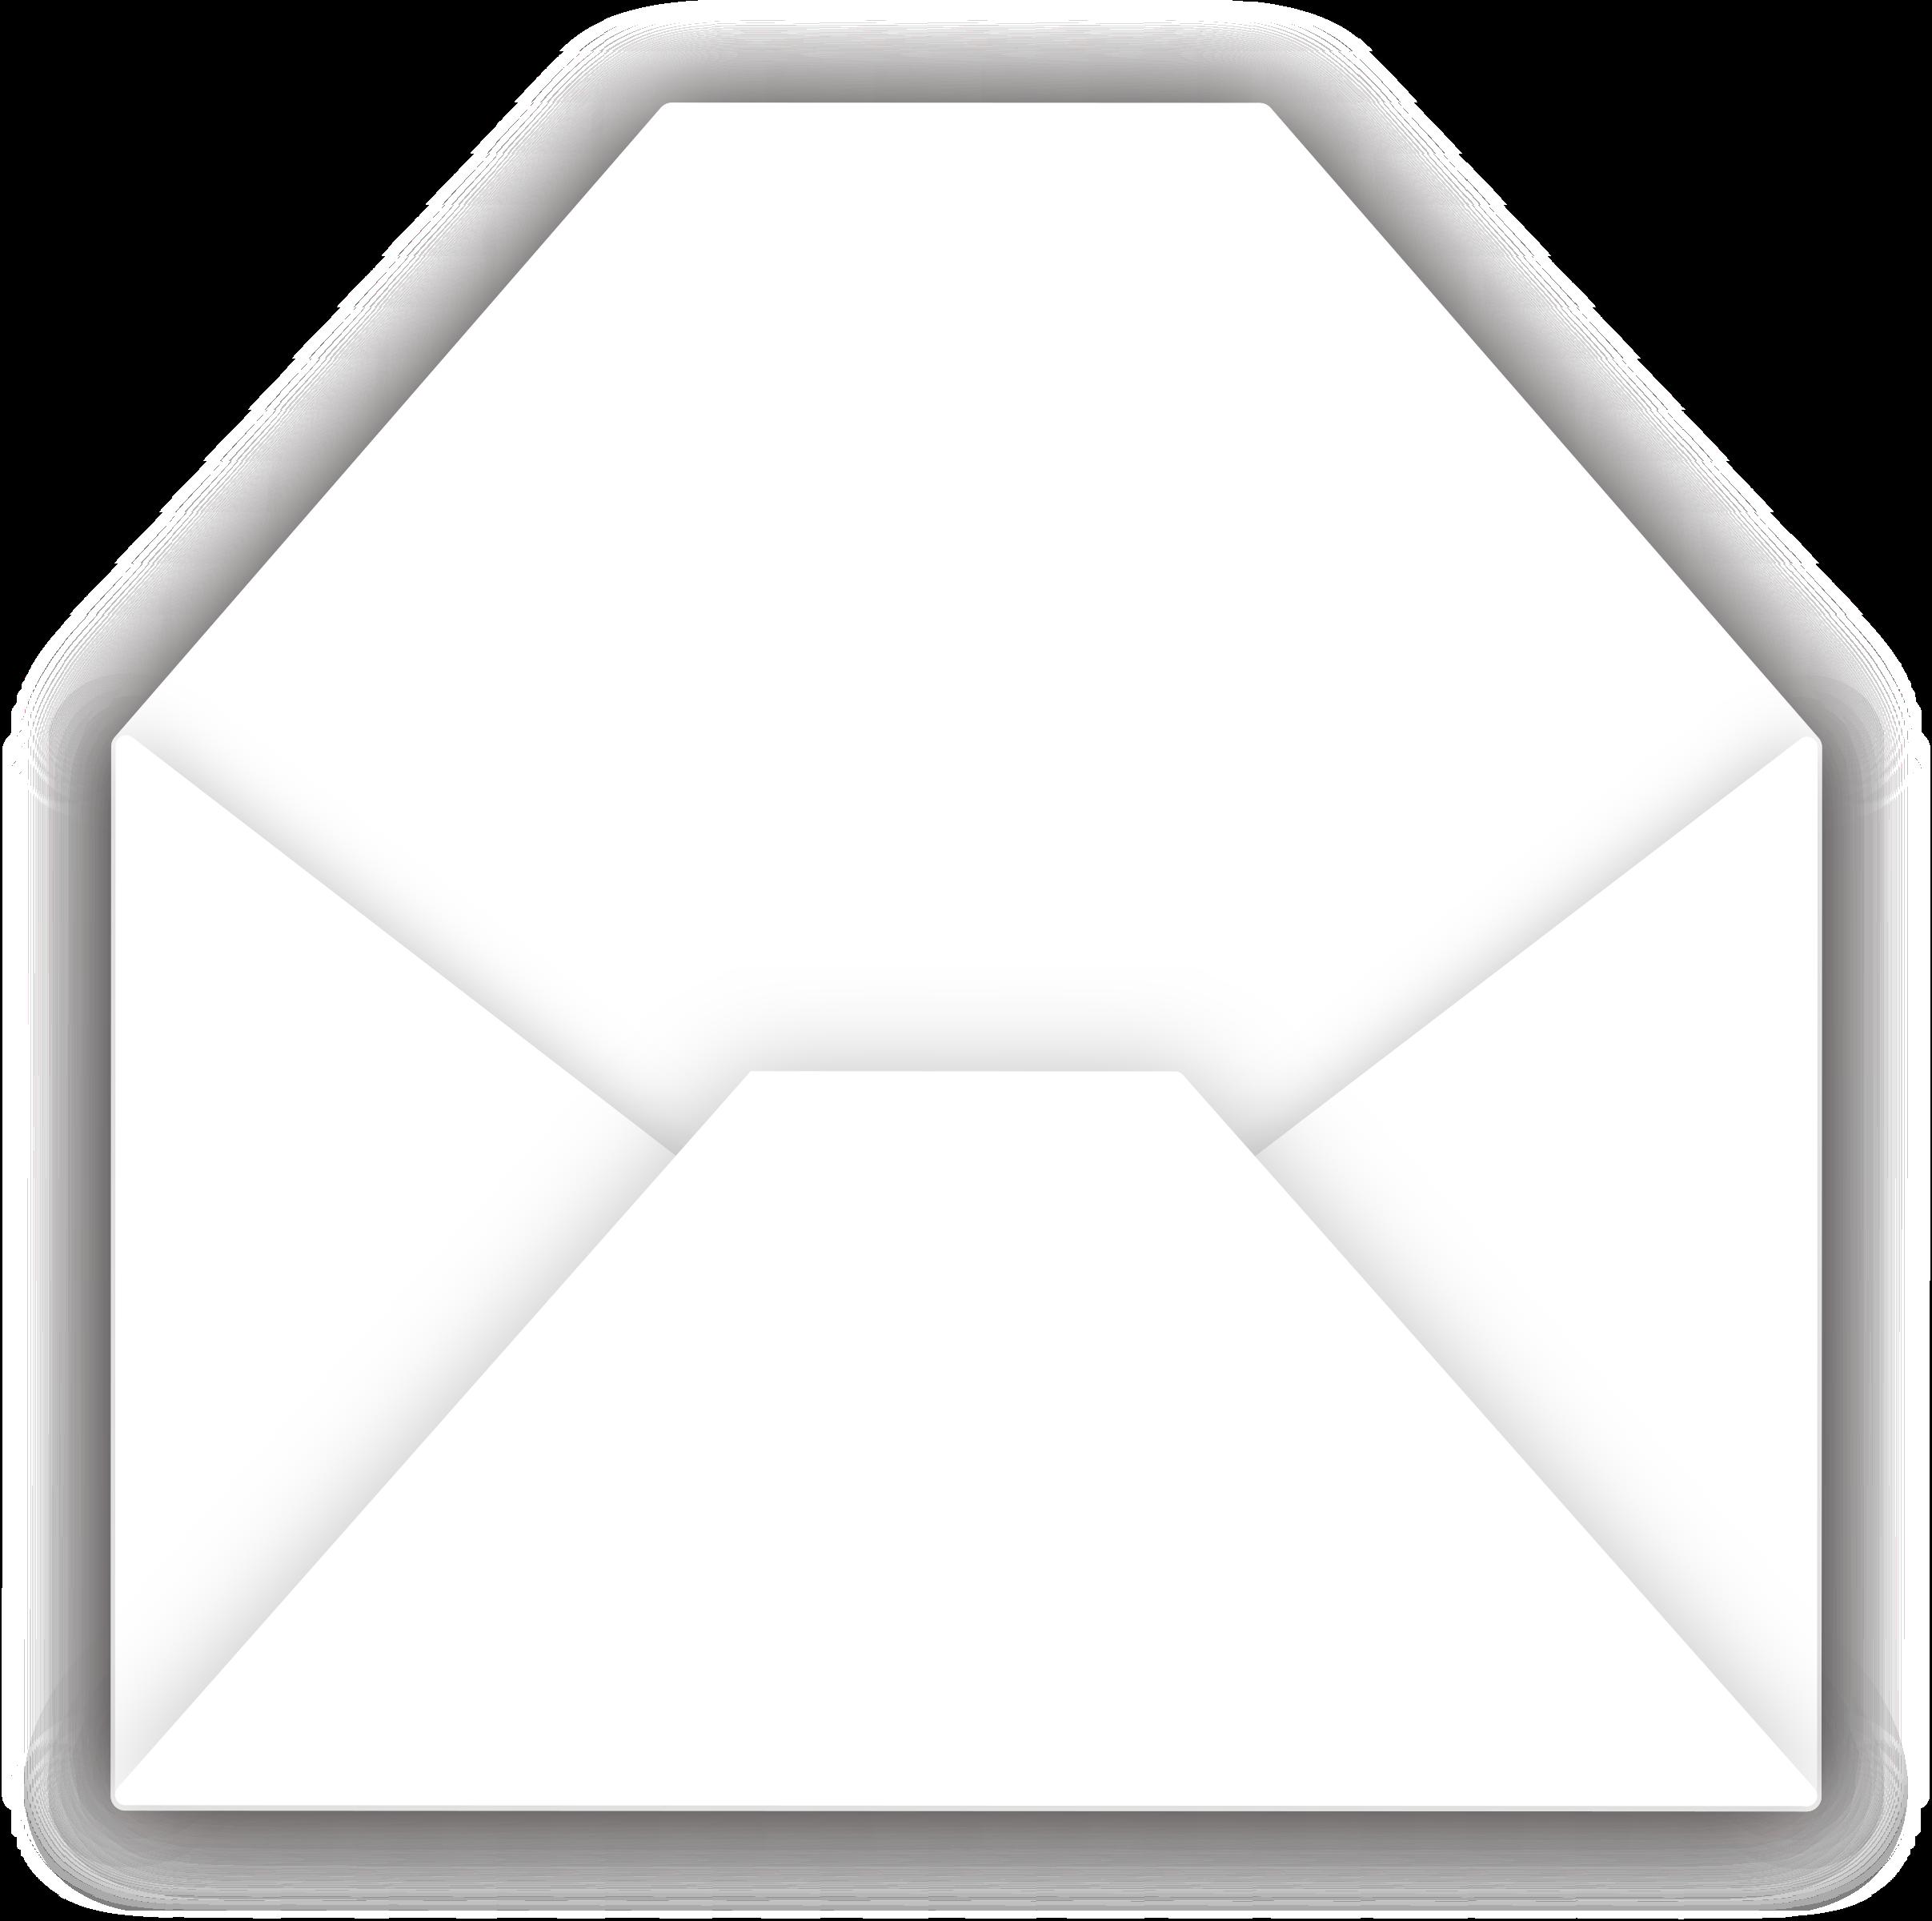 Mail clipart evelope. Envelope big image png